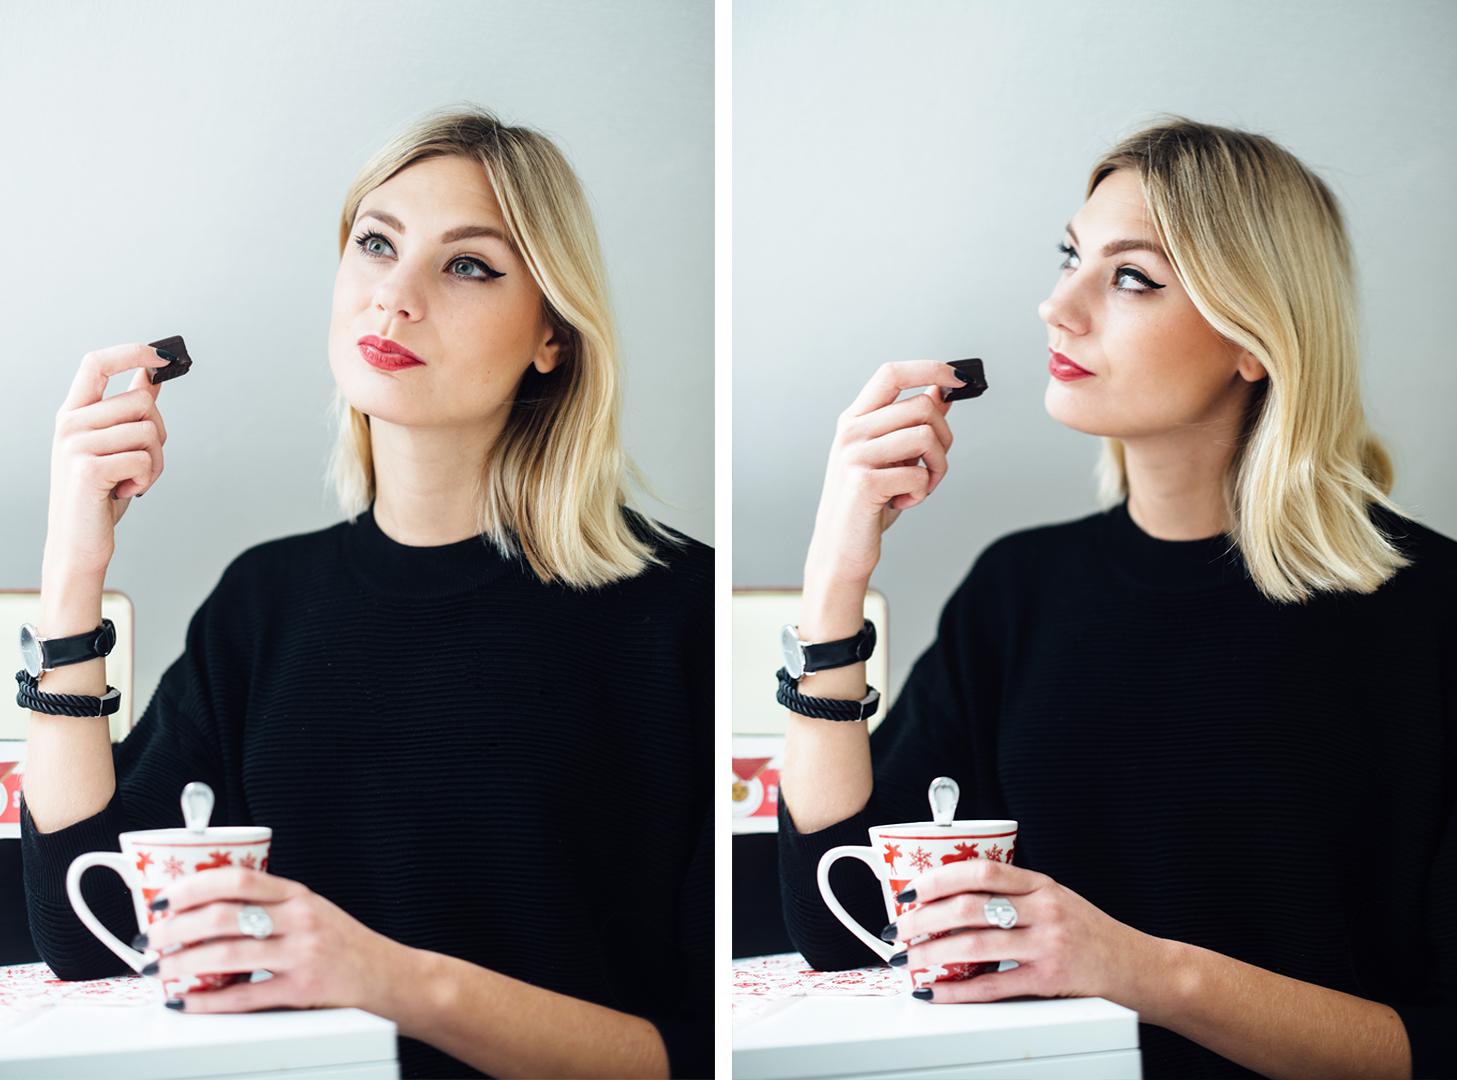 lambertz-geschenktruhe_erfahrung_review_weihnachten_outfit_inspiration_fashionblog_modeblog_kiamisu-collage2